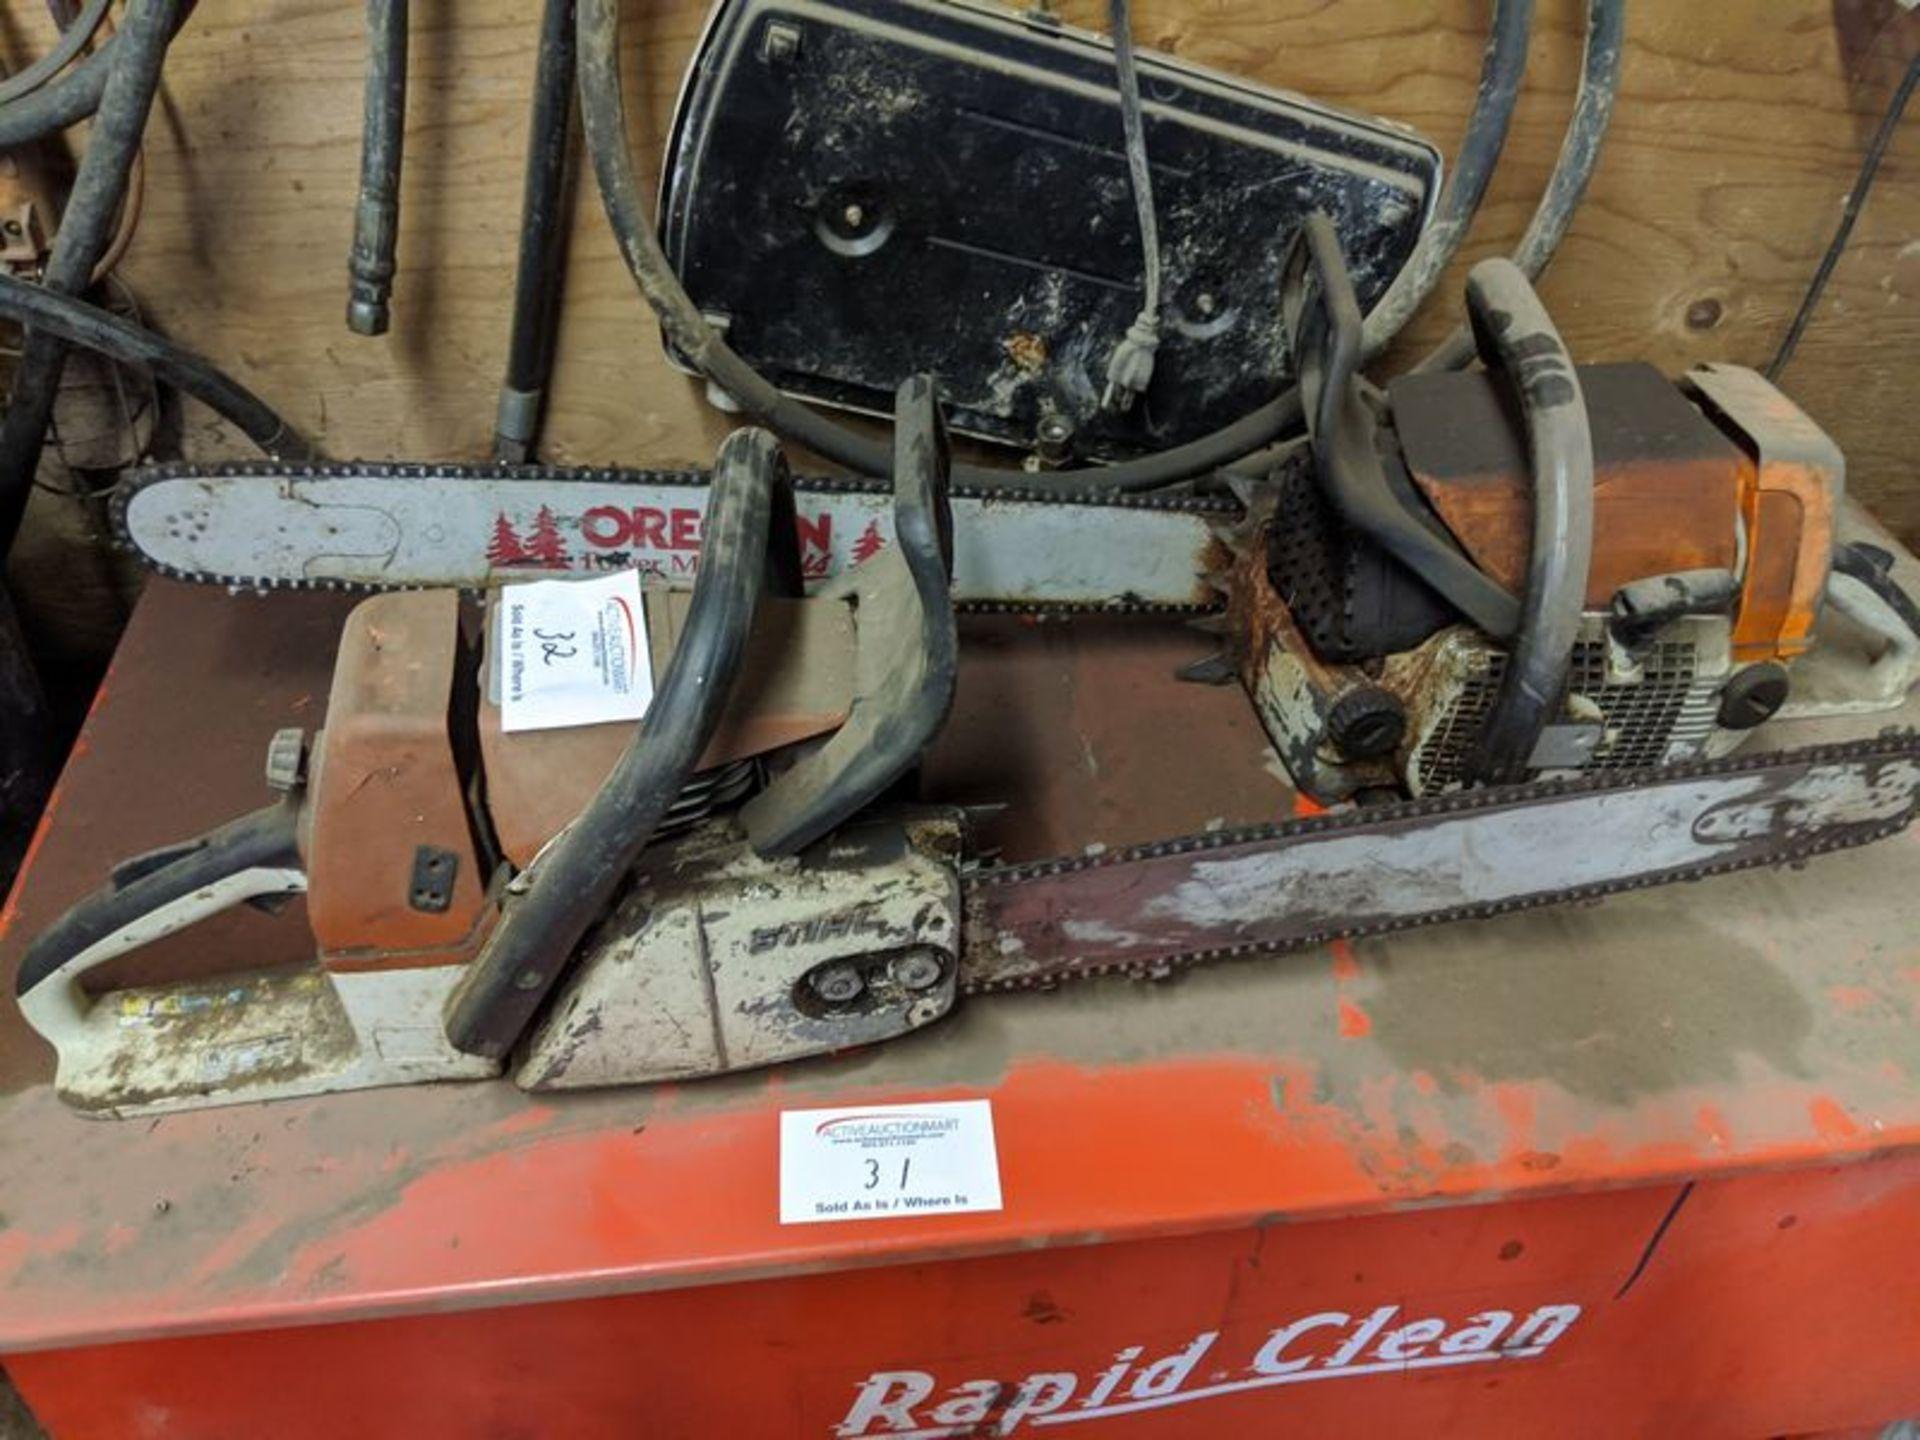 Lot 32 - Stihl Chainsaw - Condition Unknown